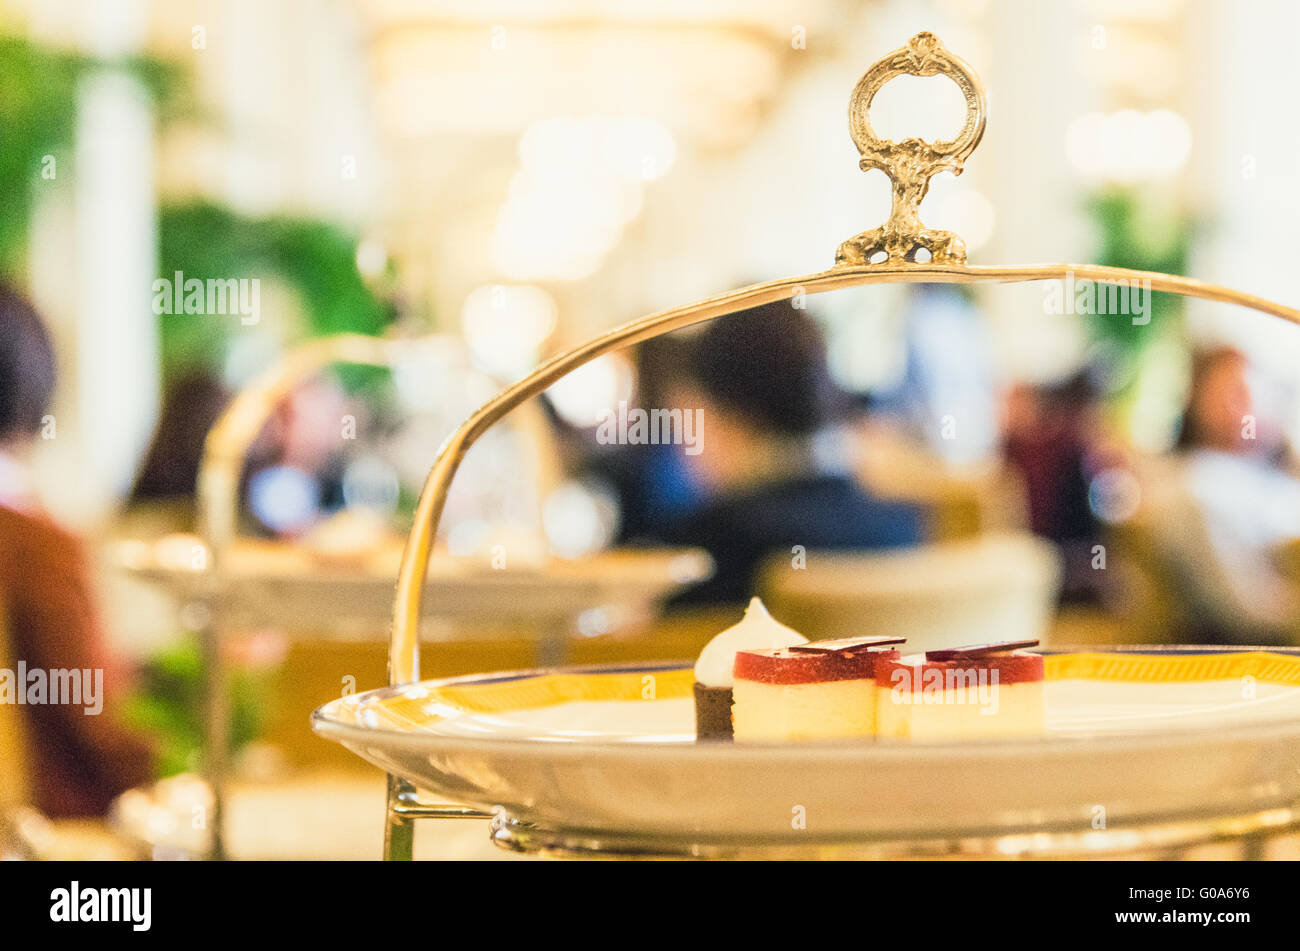 Afternoon High Tea Time at Peninsula Hong Kong - Stock Image